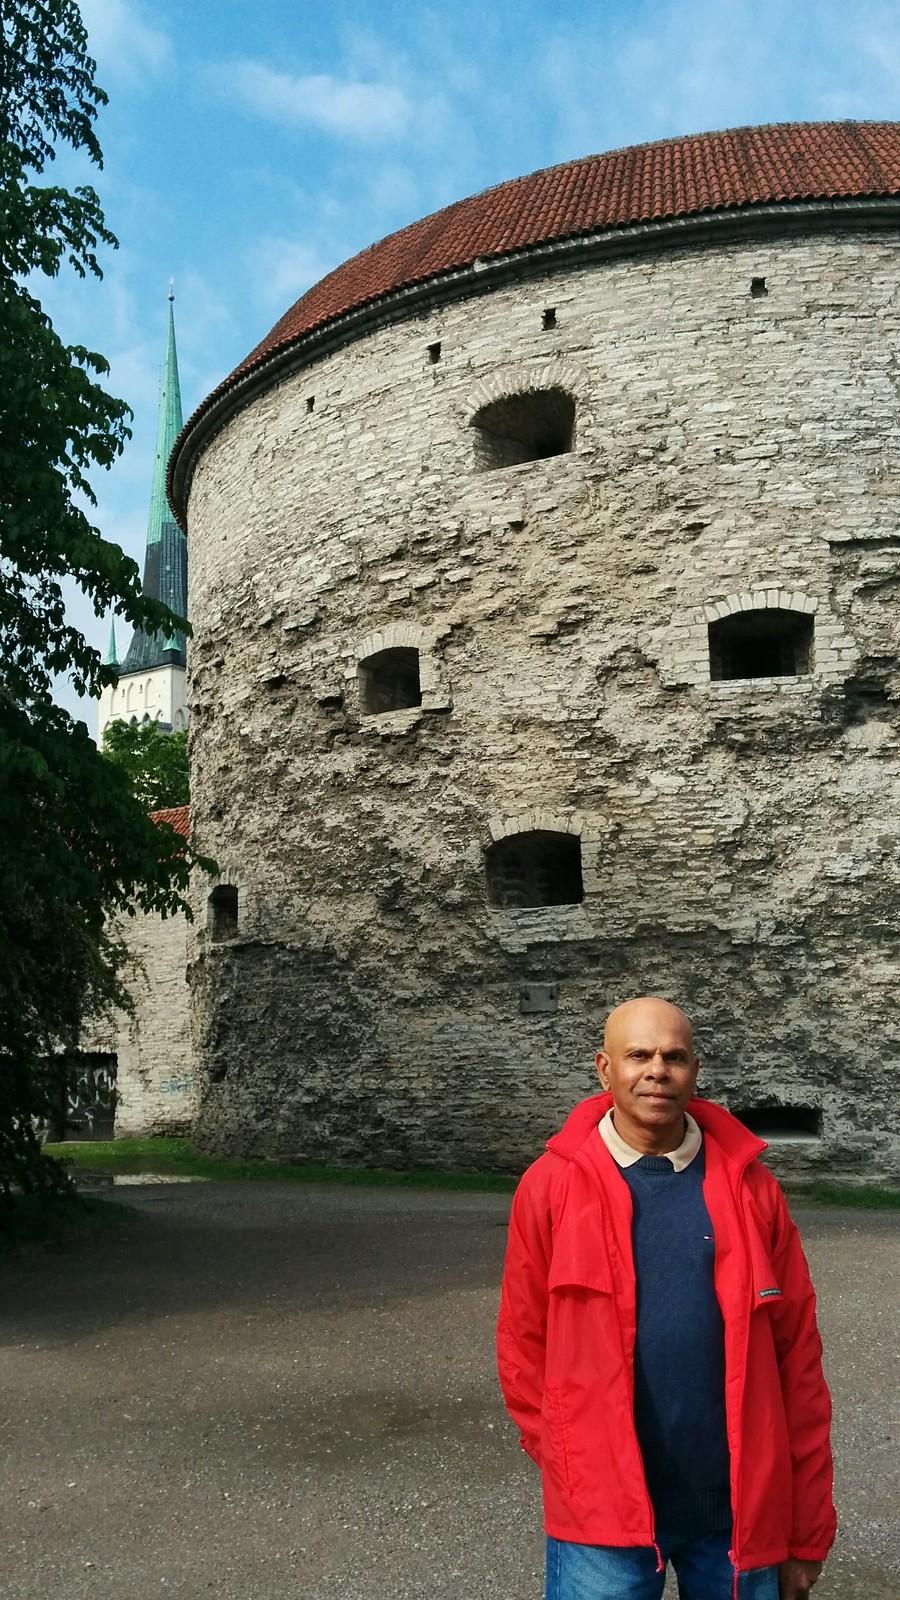 June 8th Tallinn